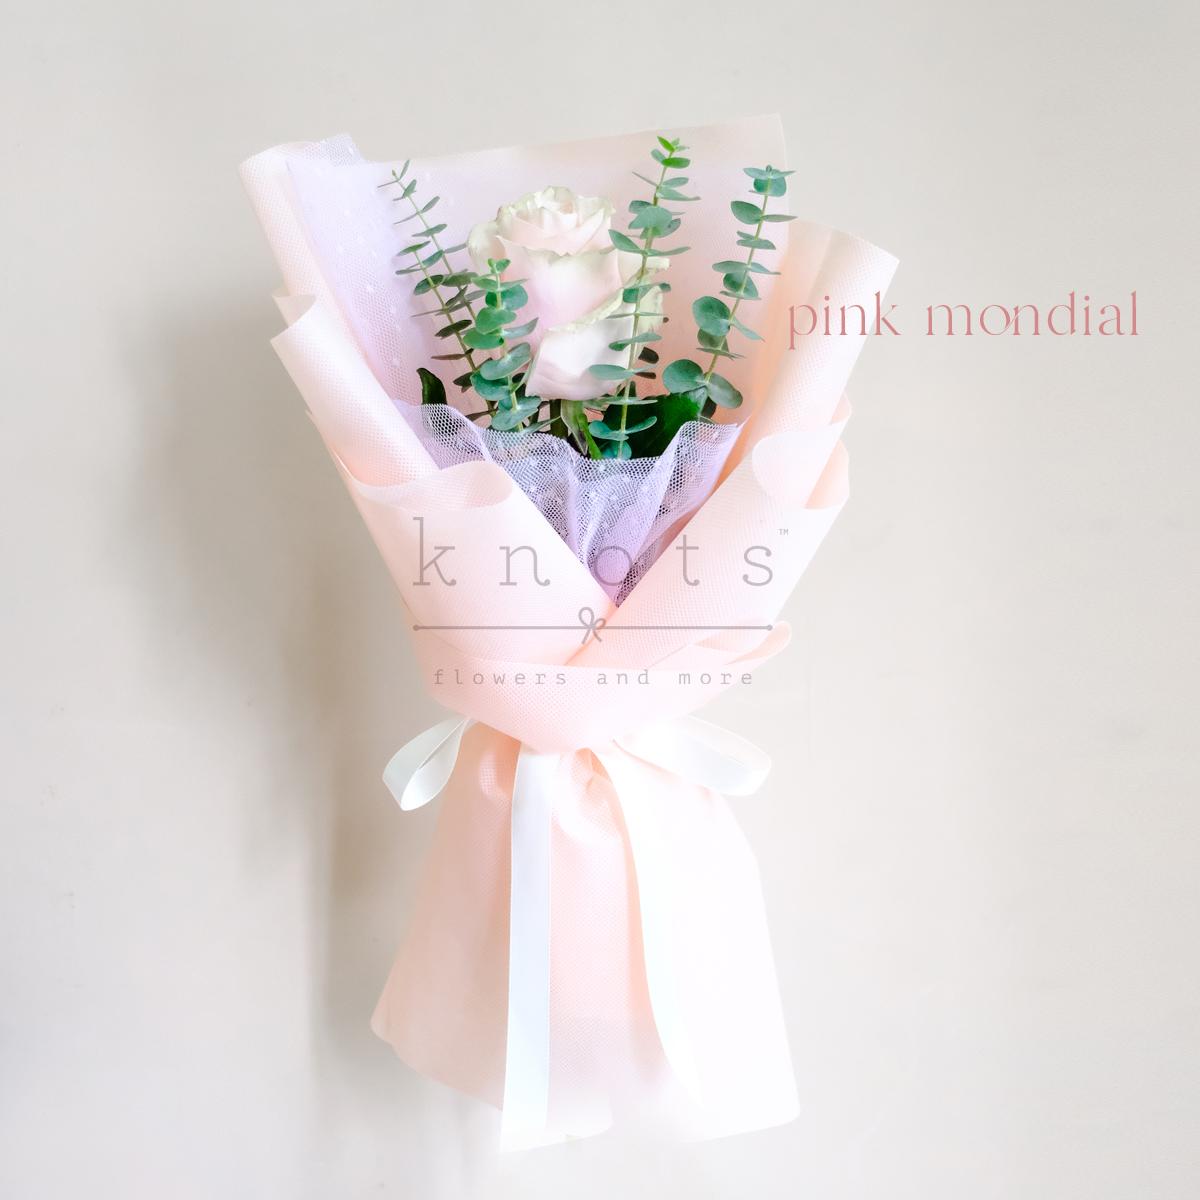 Pink Mondial Bouquet